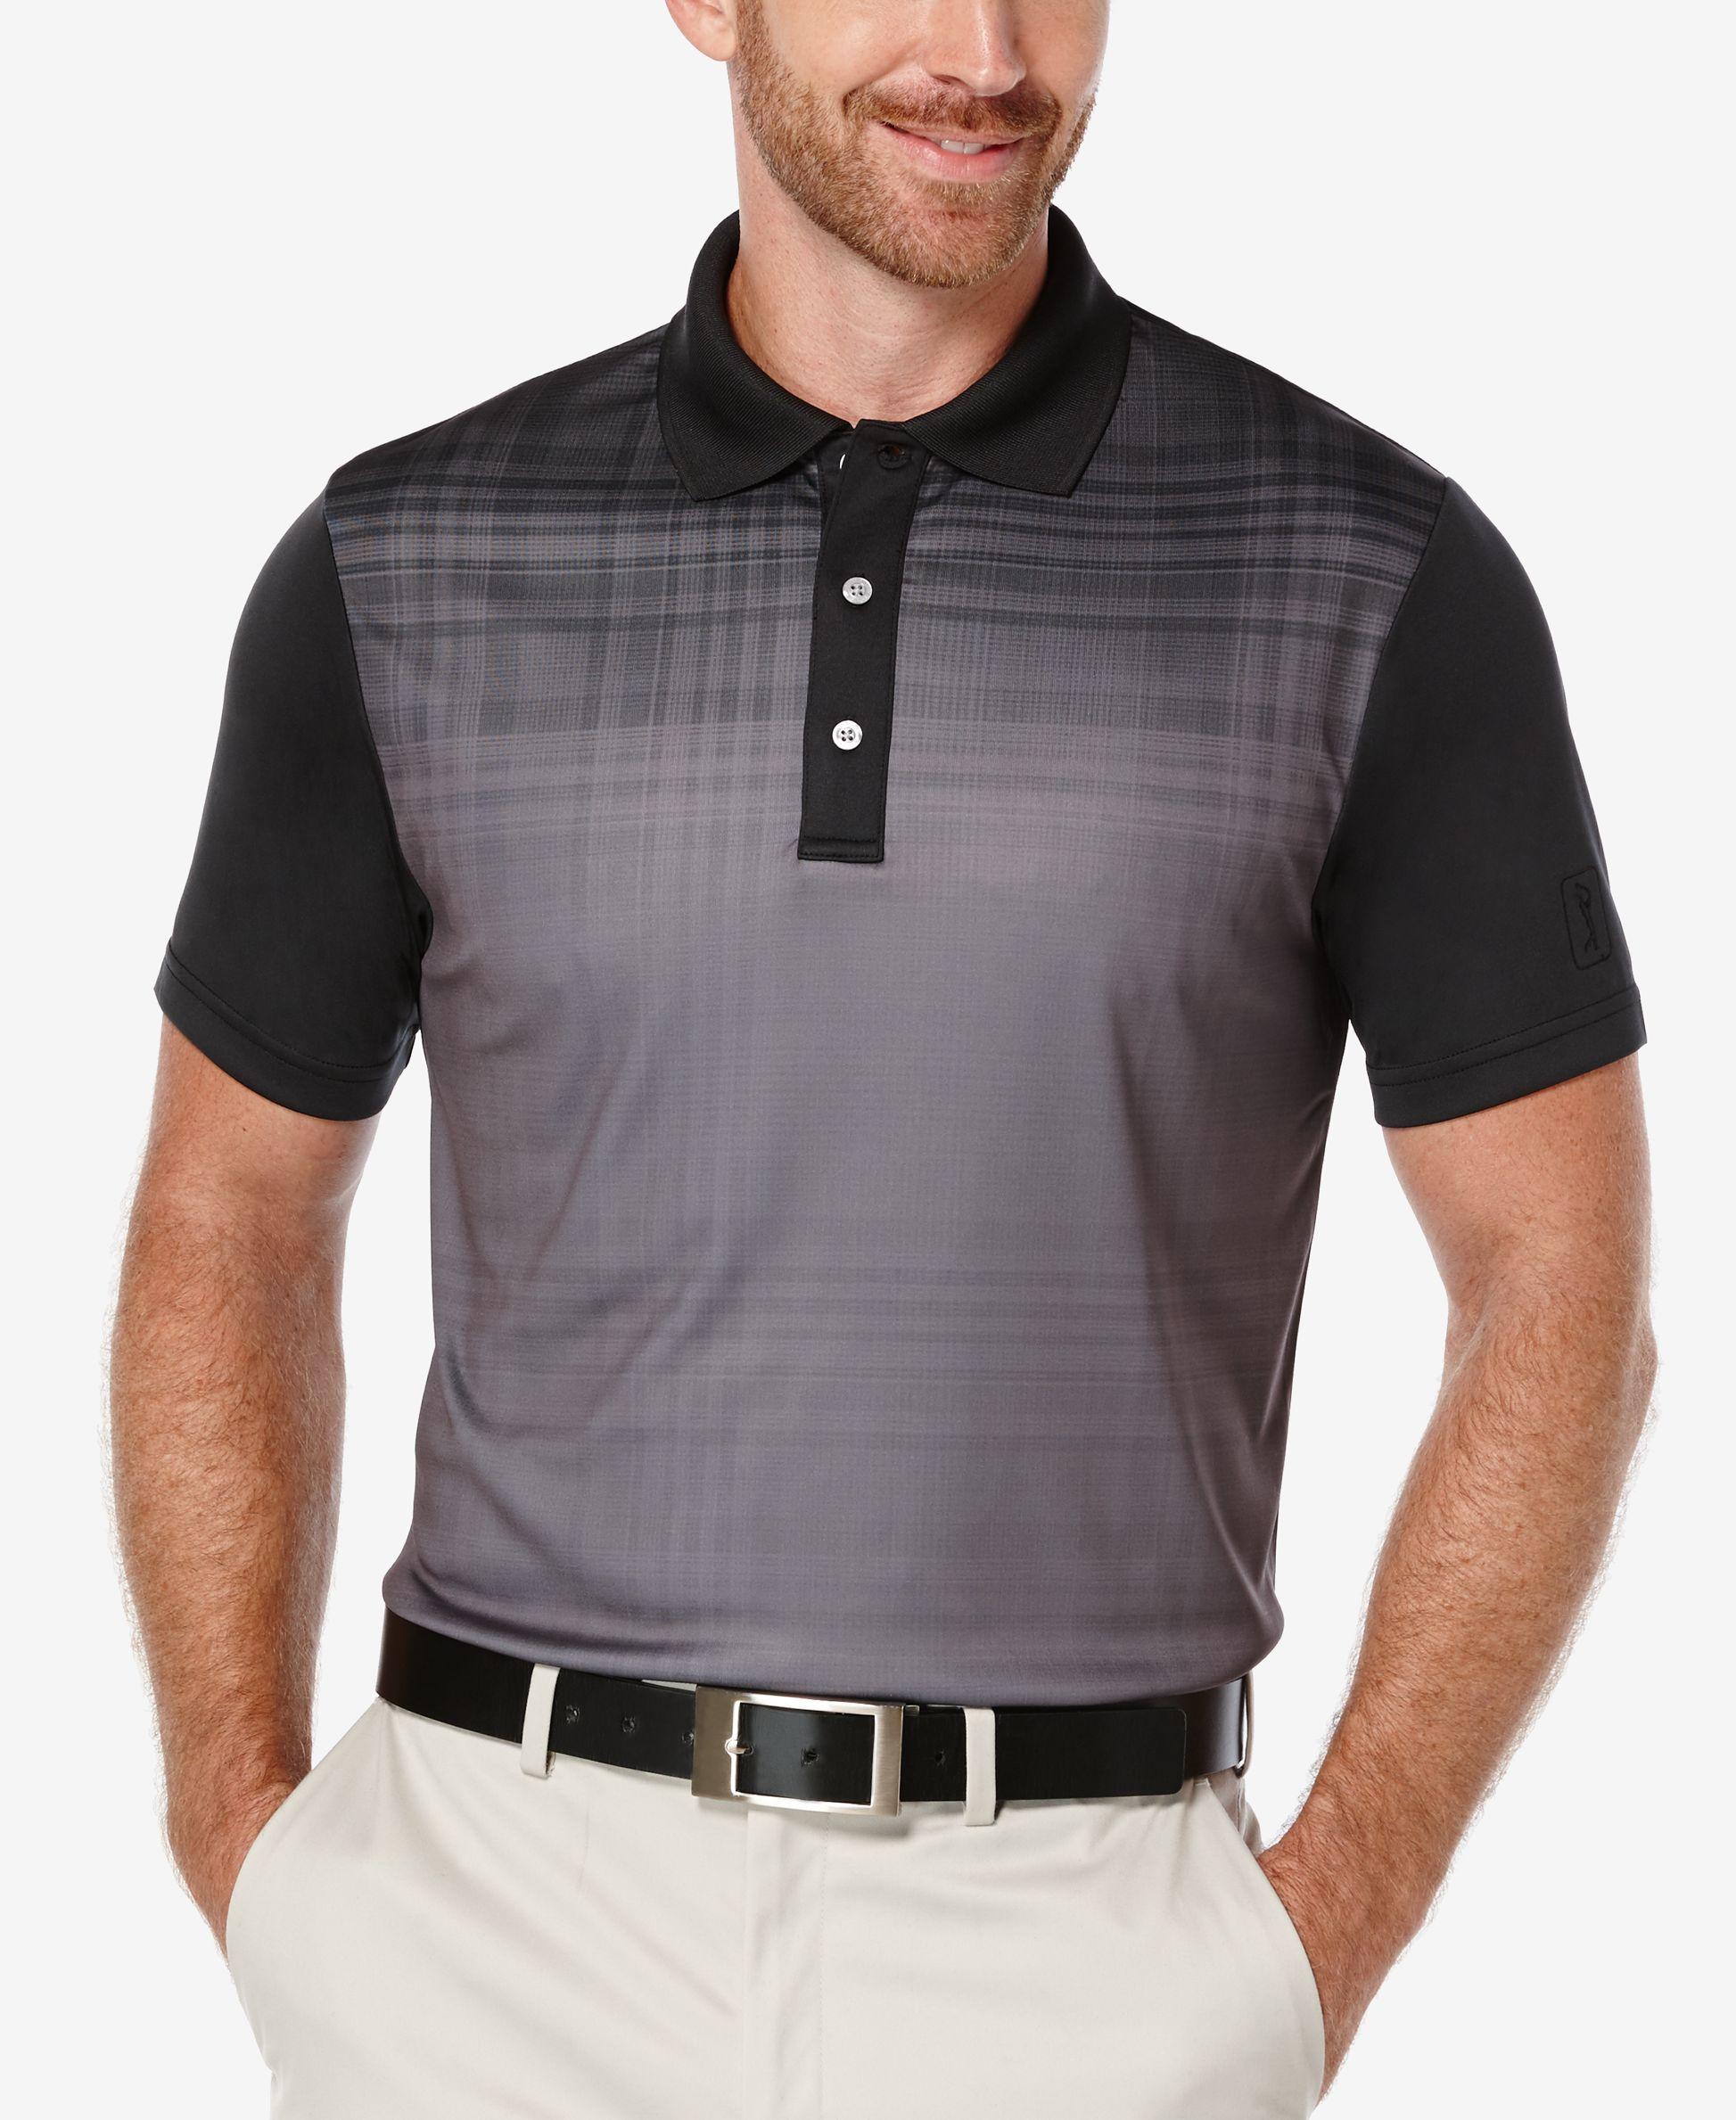 Pga Tour Men S Fading Plaid Colorblocked Polo Shirt In